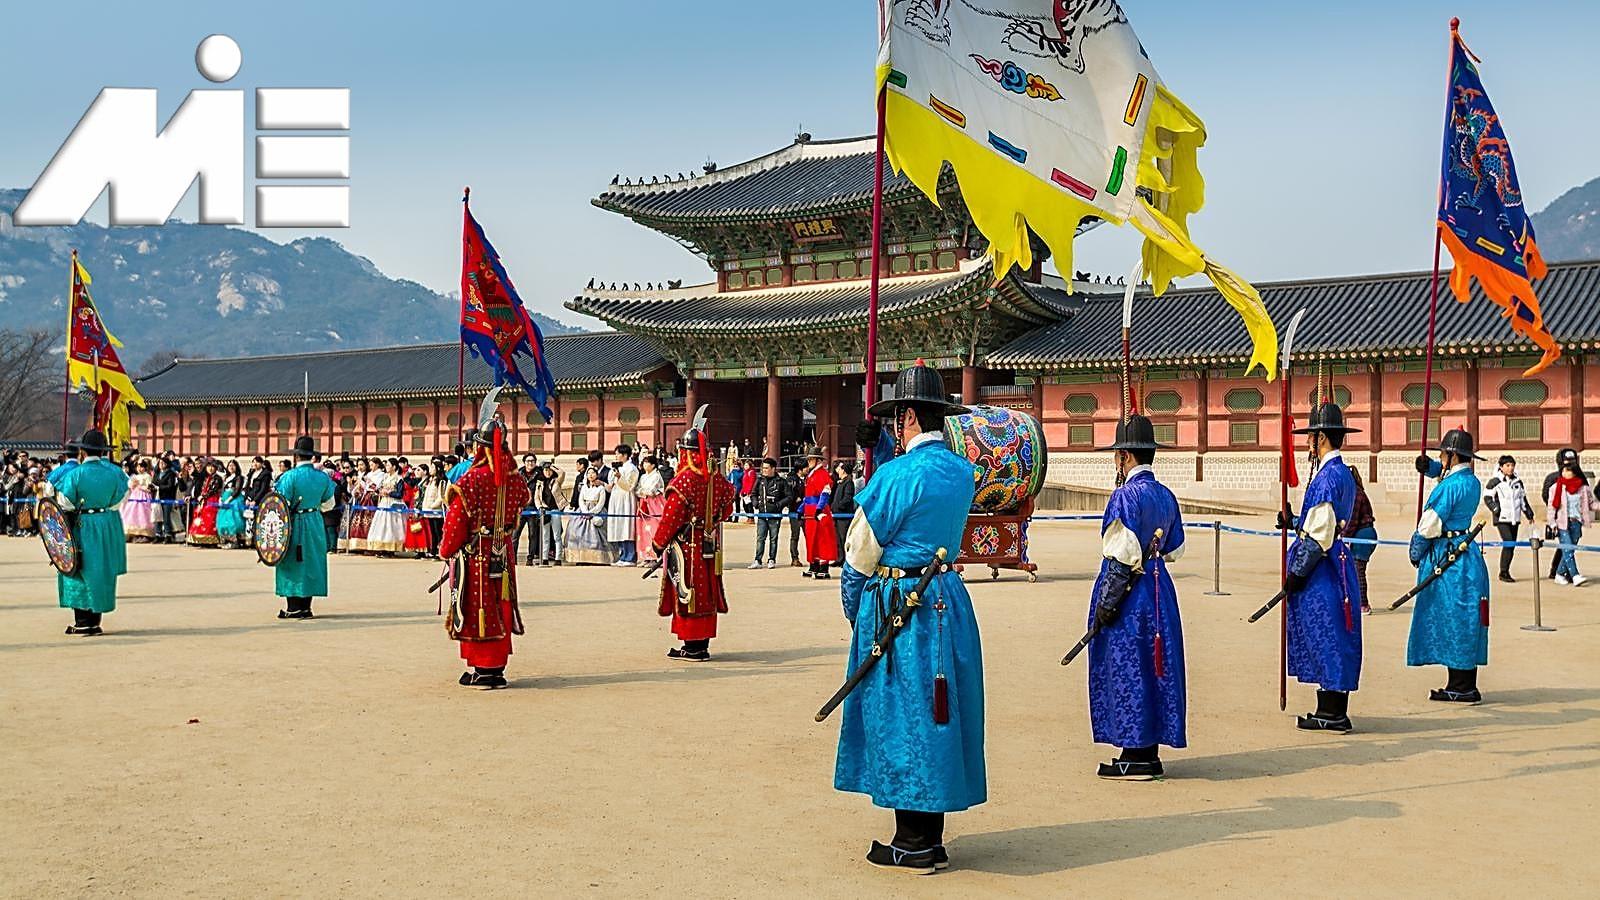 کره جنوبی ـ کشور کره جنوبی ـ ویزای کره جنوبی ـ پاسپورت کره جنوبی ـ مهاجرت به کره جنوبی ـ ویزای توریستی کره جنوبی